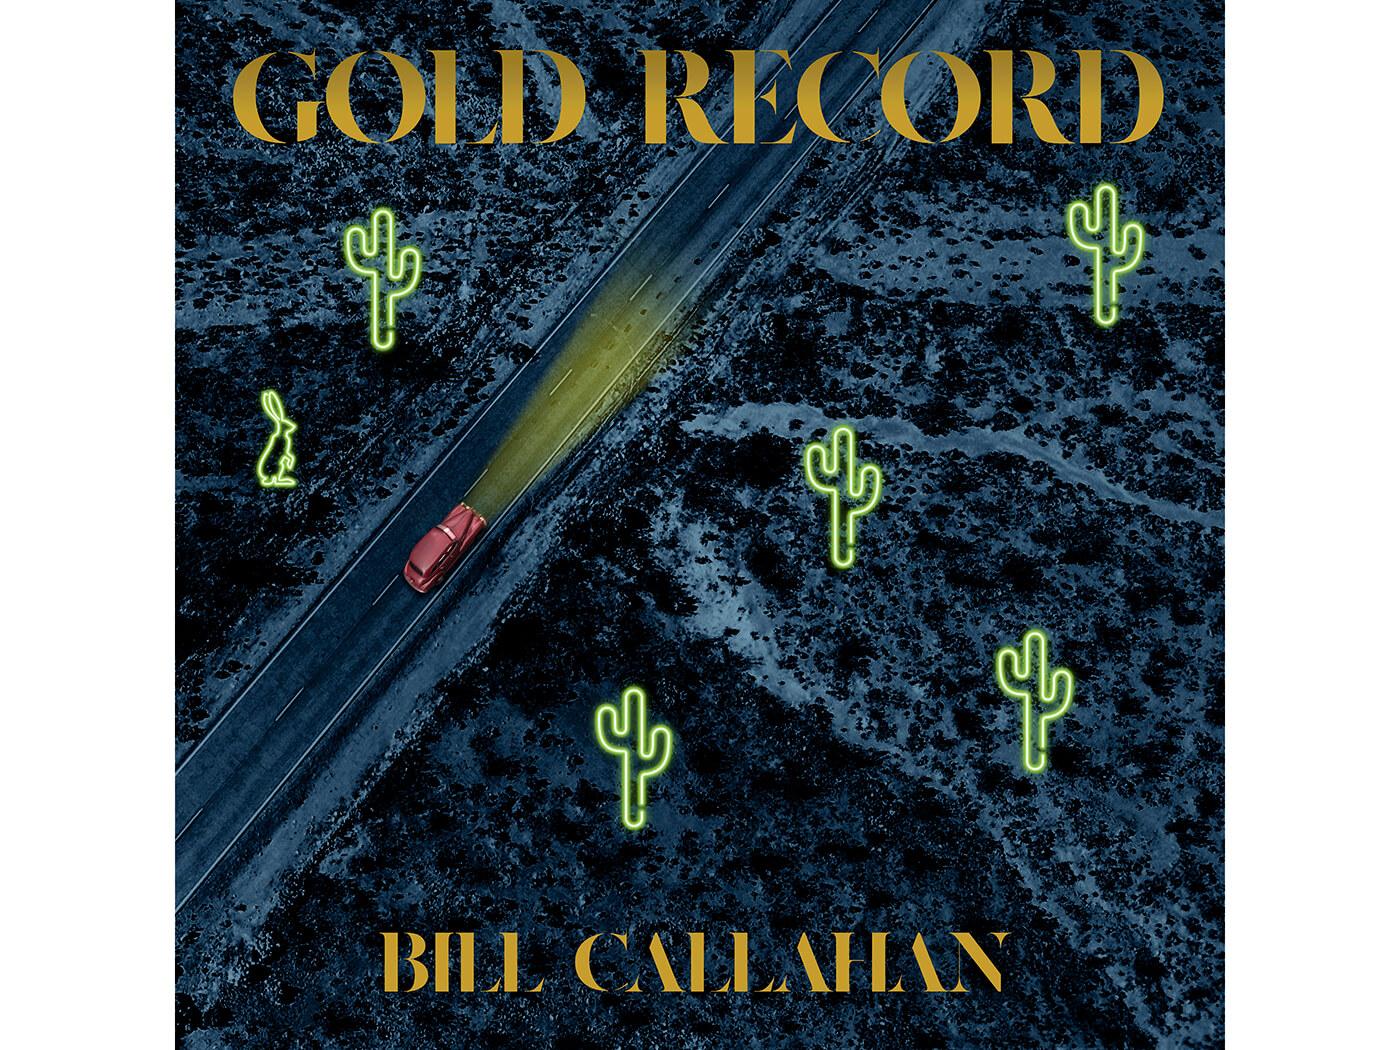 Bill Callahan announces new album, Gold Record